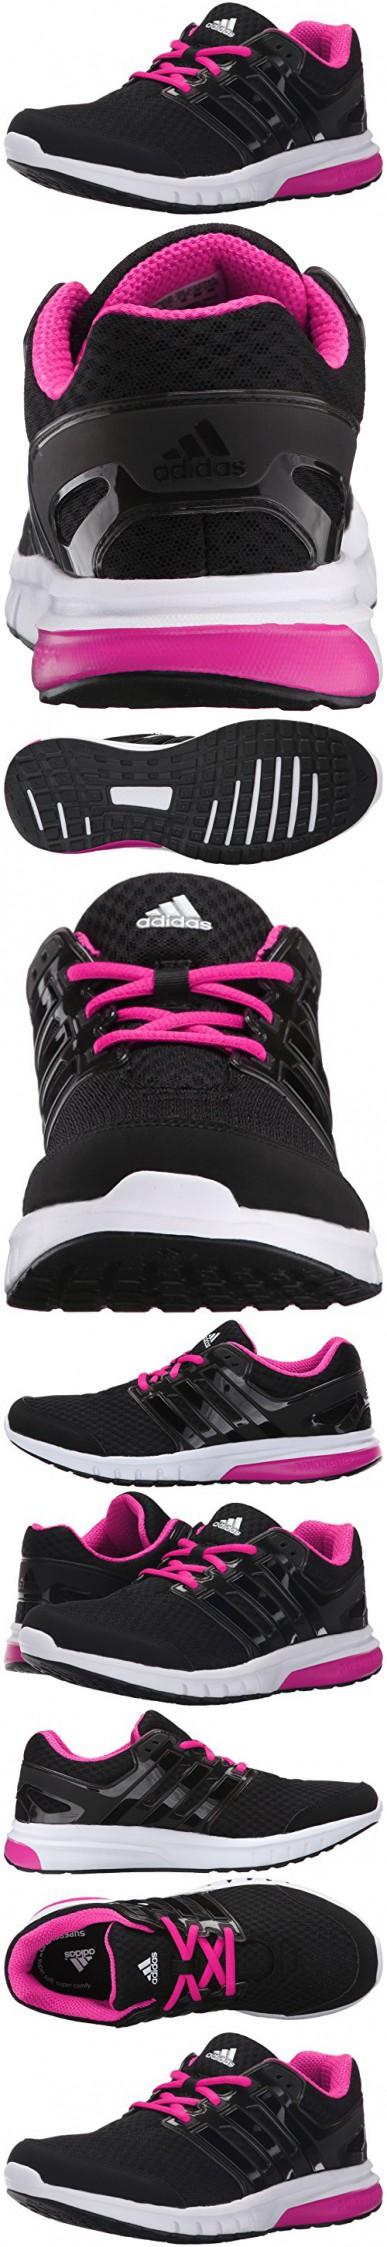 adidas cq2201 adidas stan smith chaussure blanc